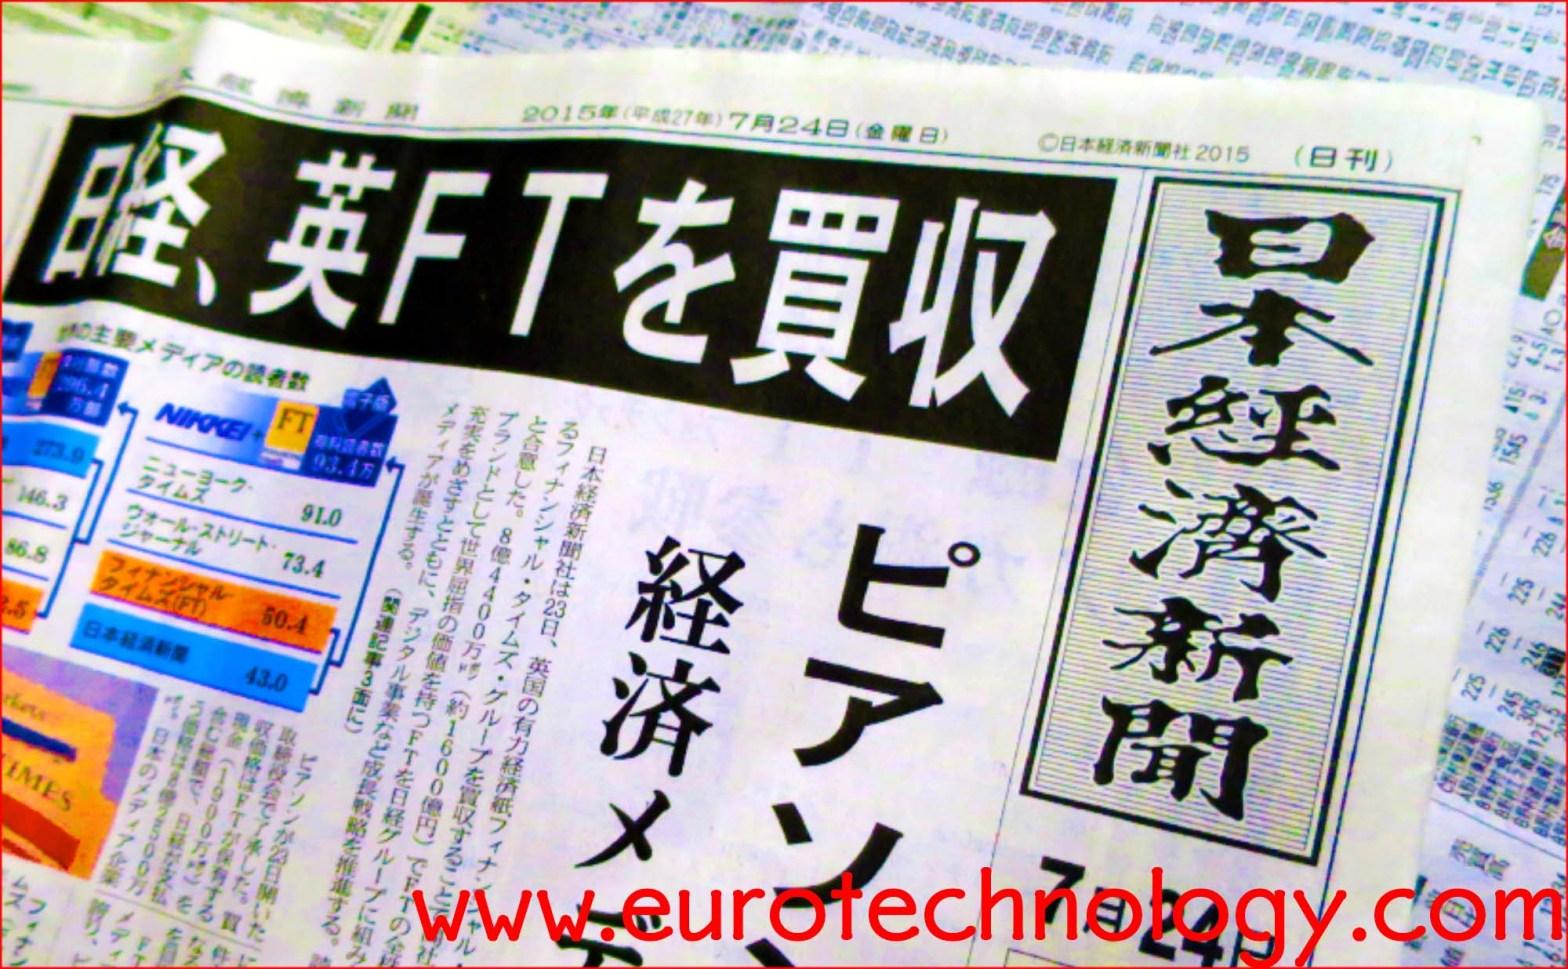 Financial Times to be sold to Nihon Keizai Shinbun Corporation (株式会社日本経済新聞社, Nikkei Inc.)